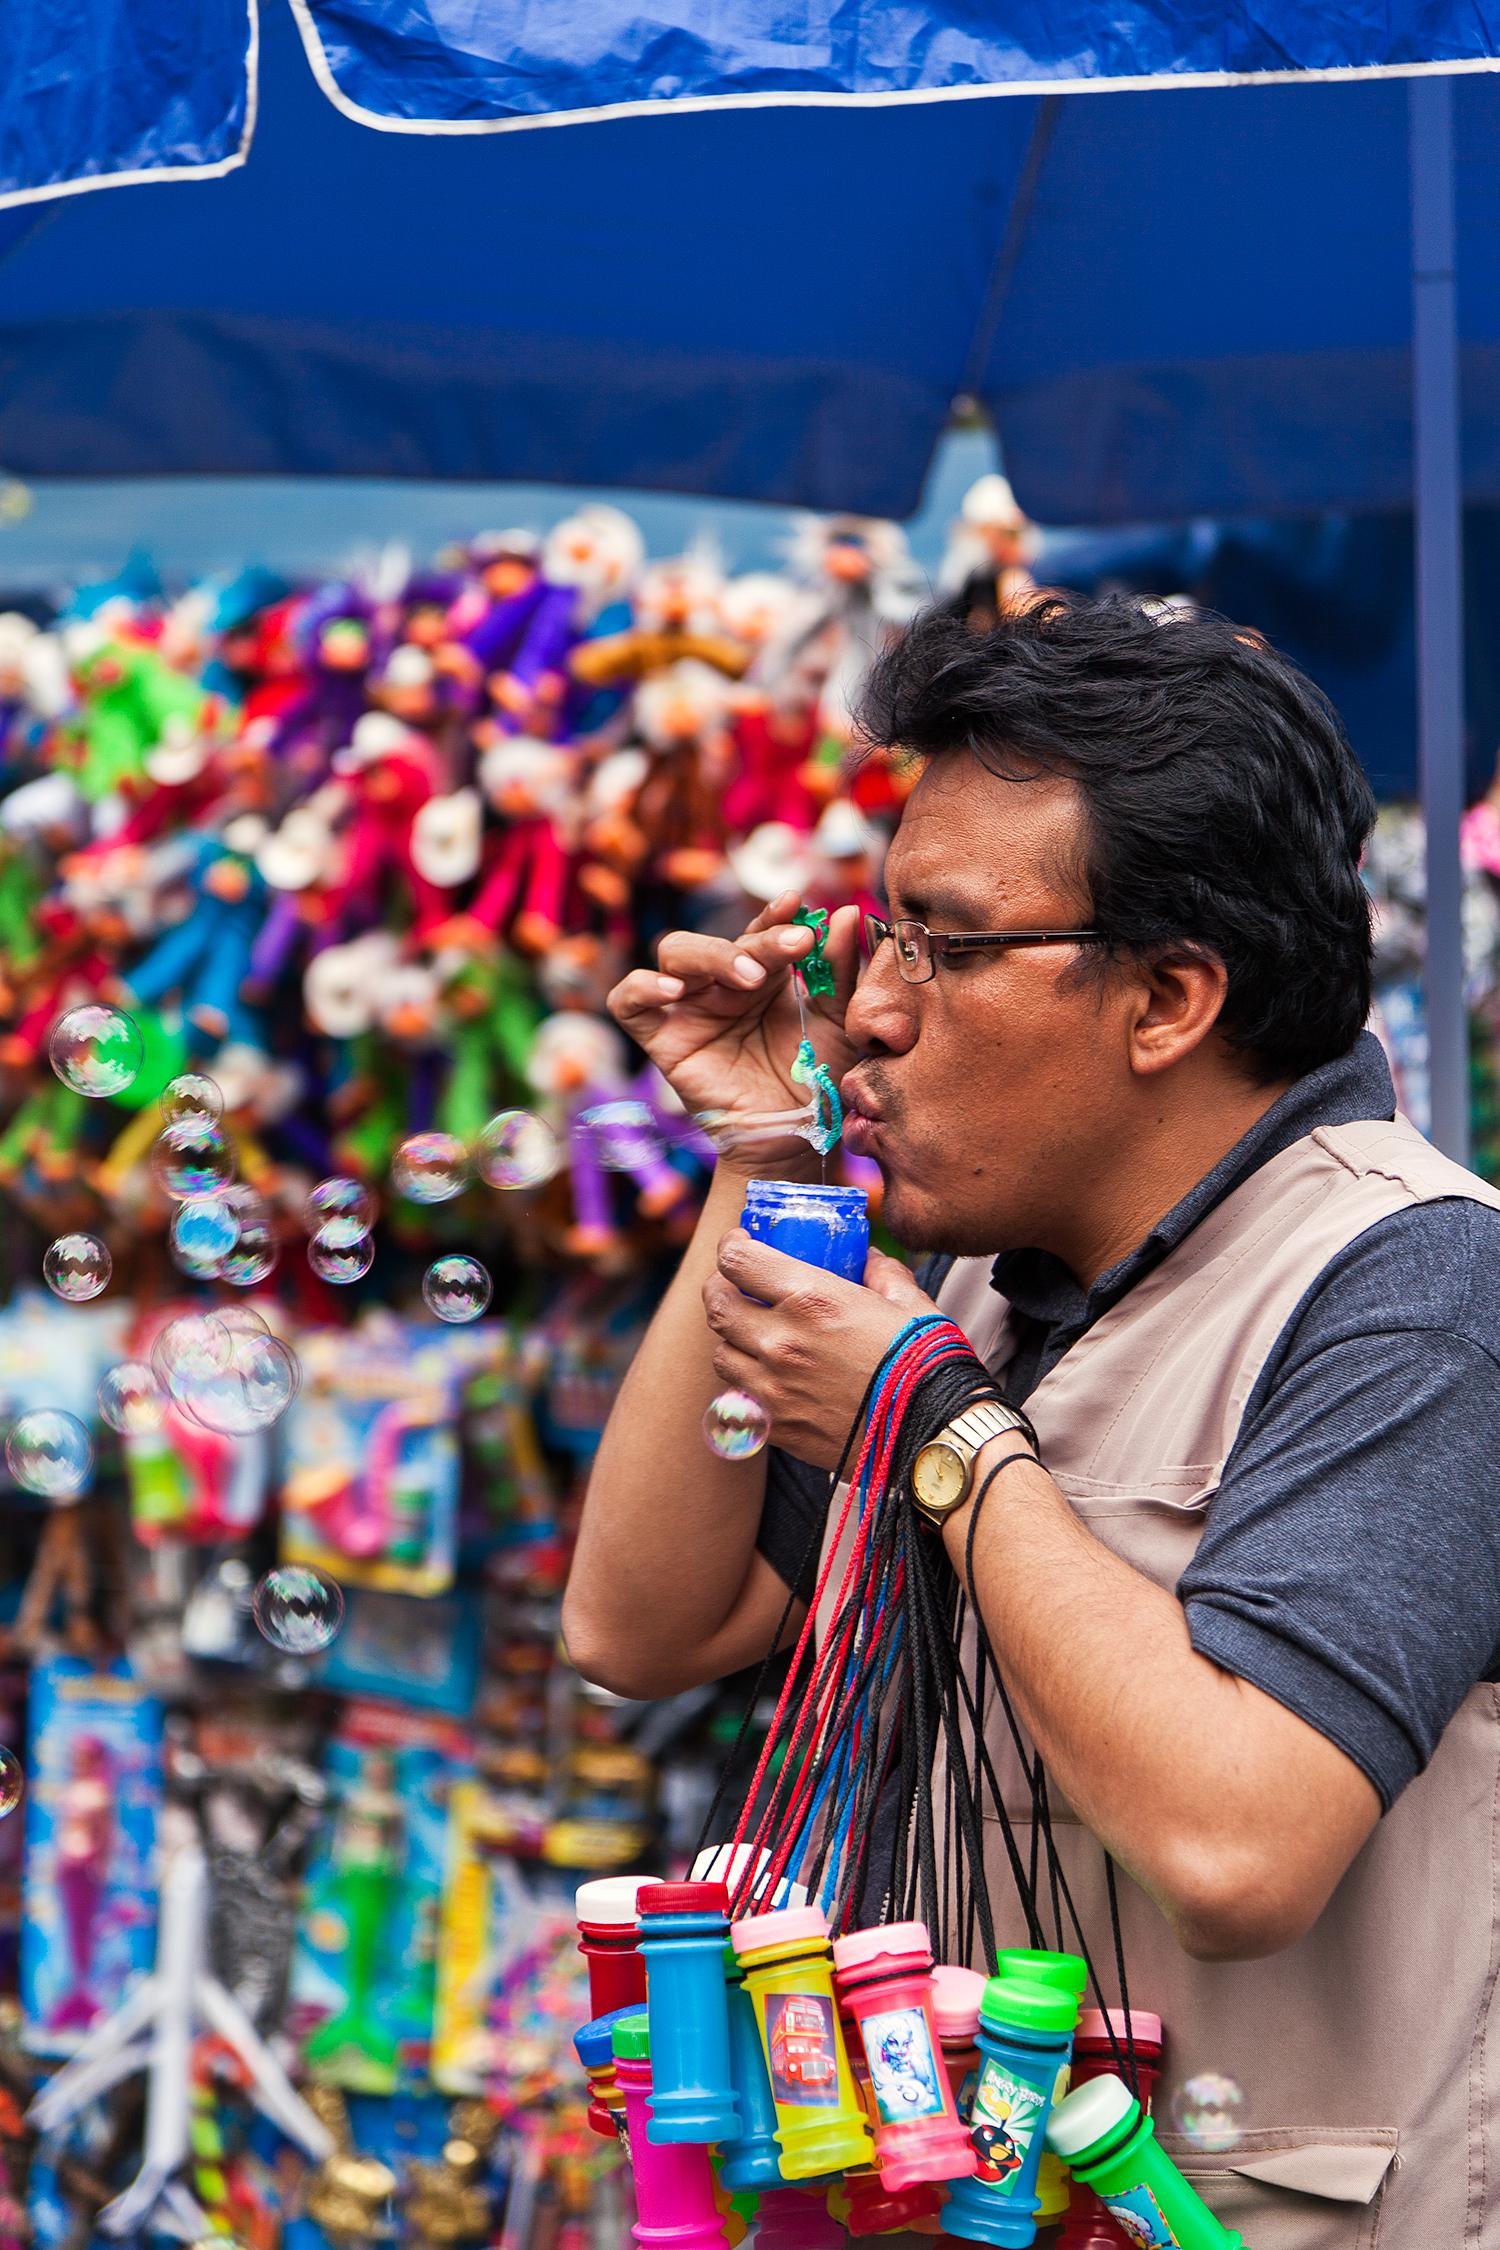 man blowing bubbles chapultepec park mexico city.jpg